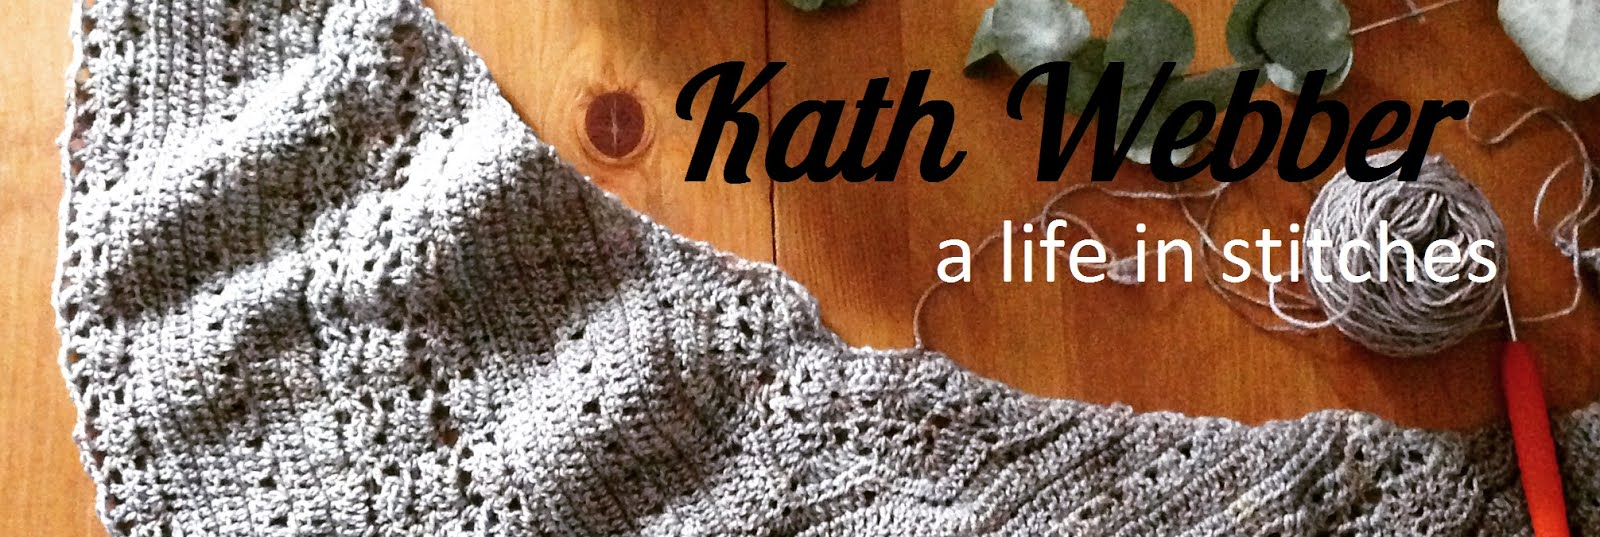 Kath Webber Crochet